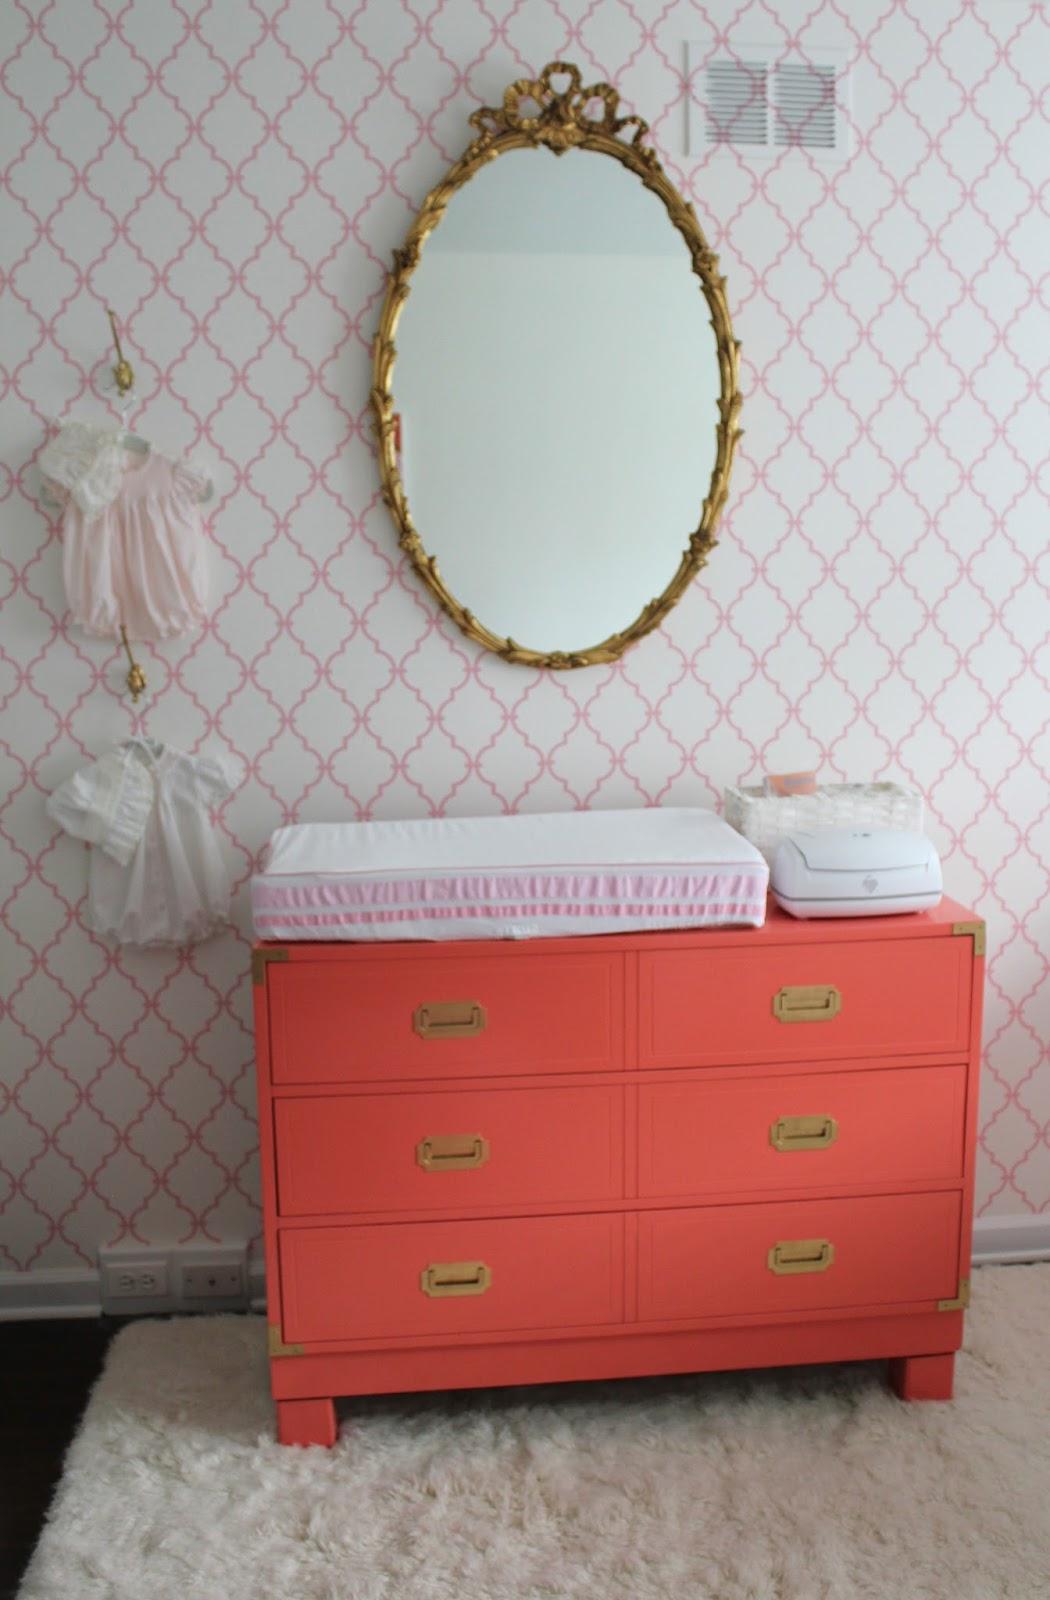 Imperfect Polish Baby Girl Nursery